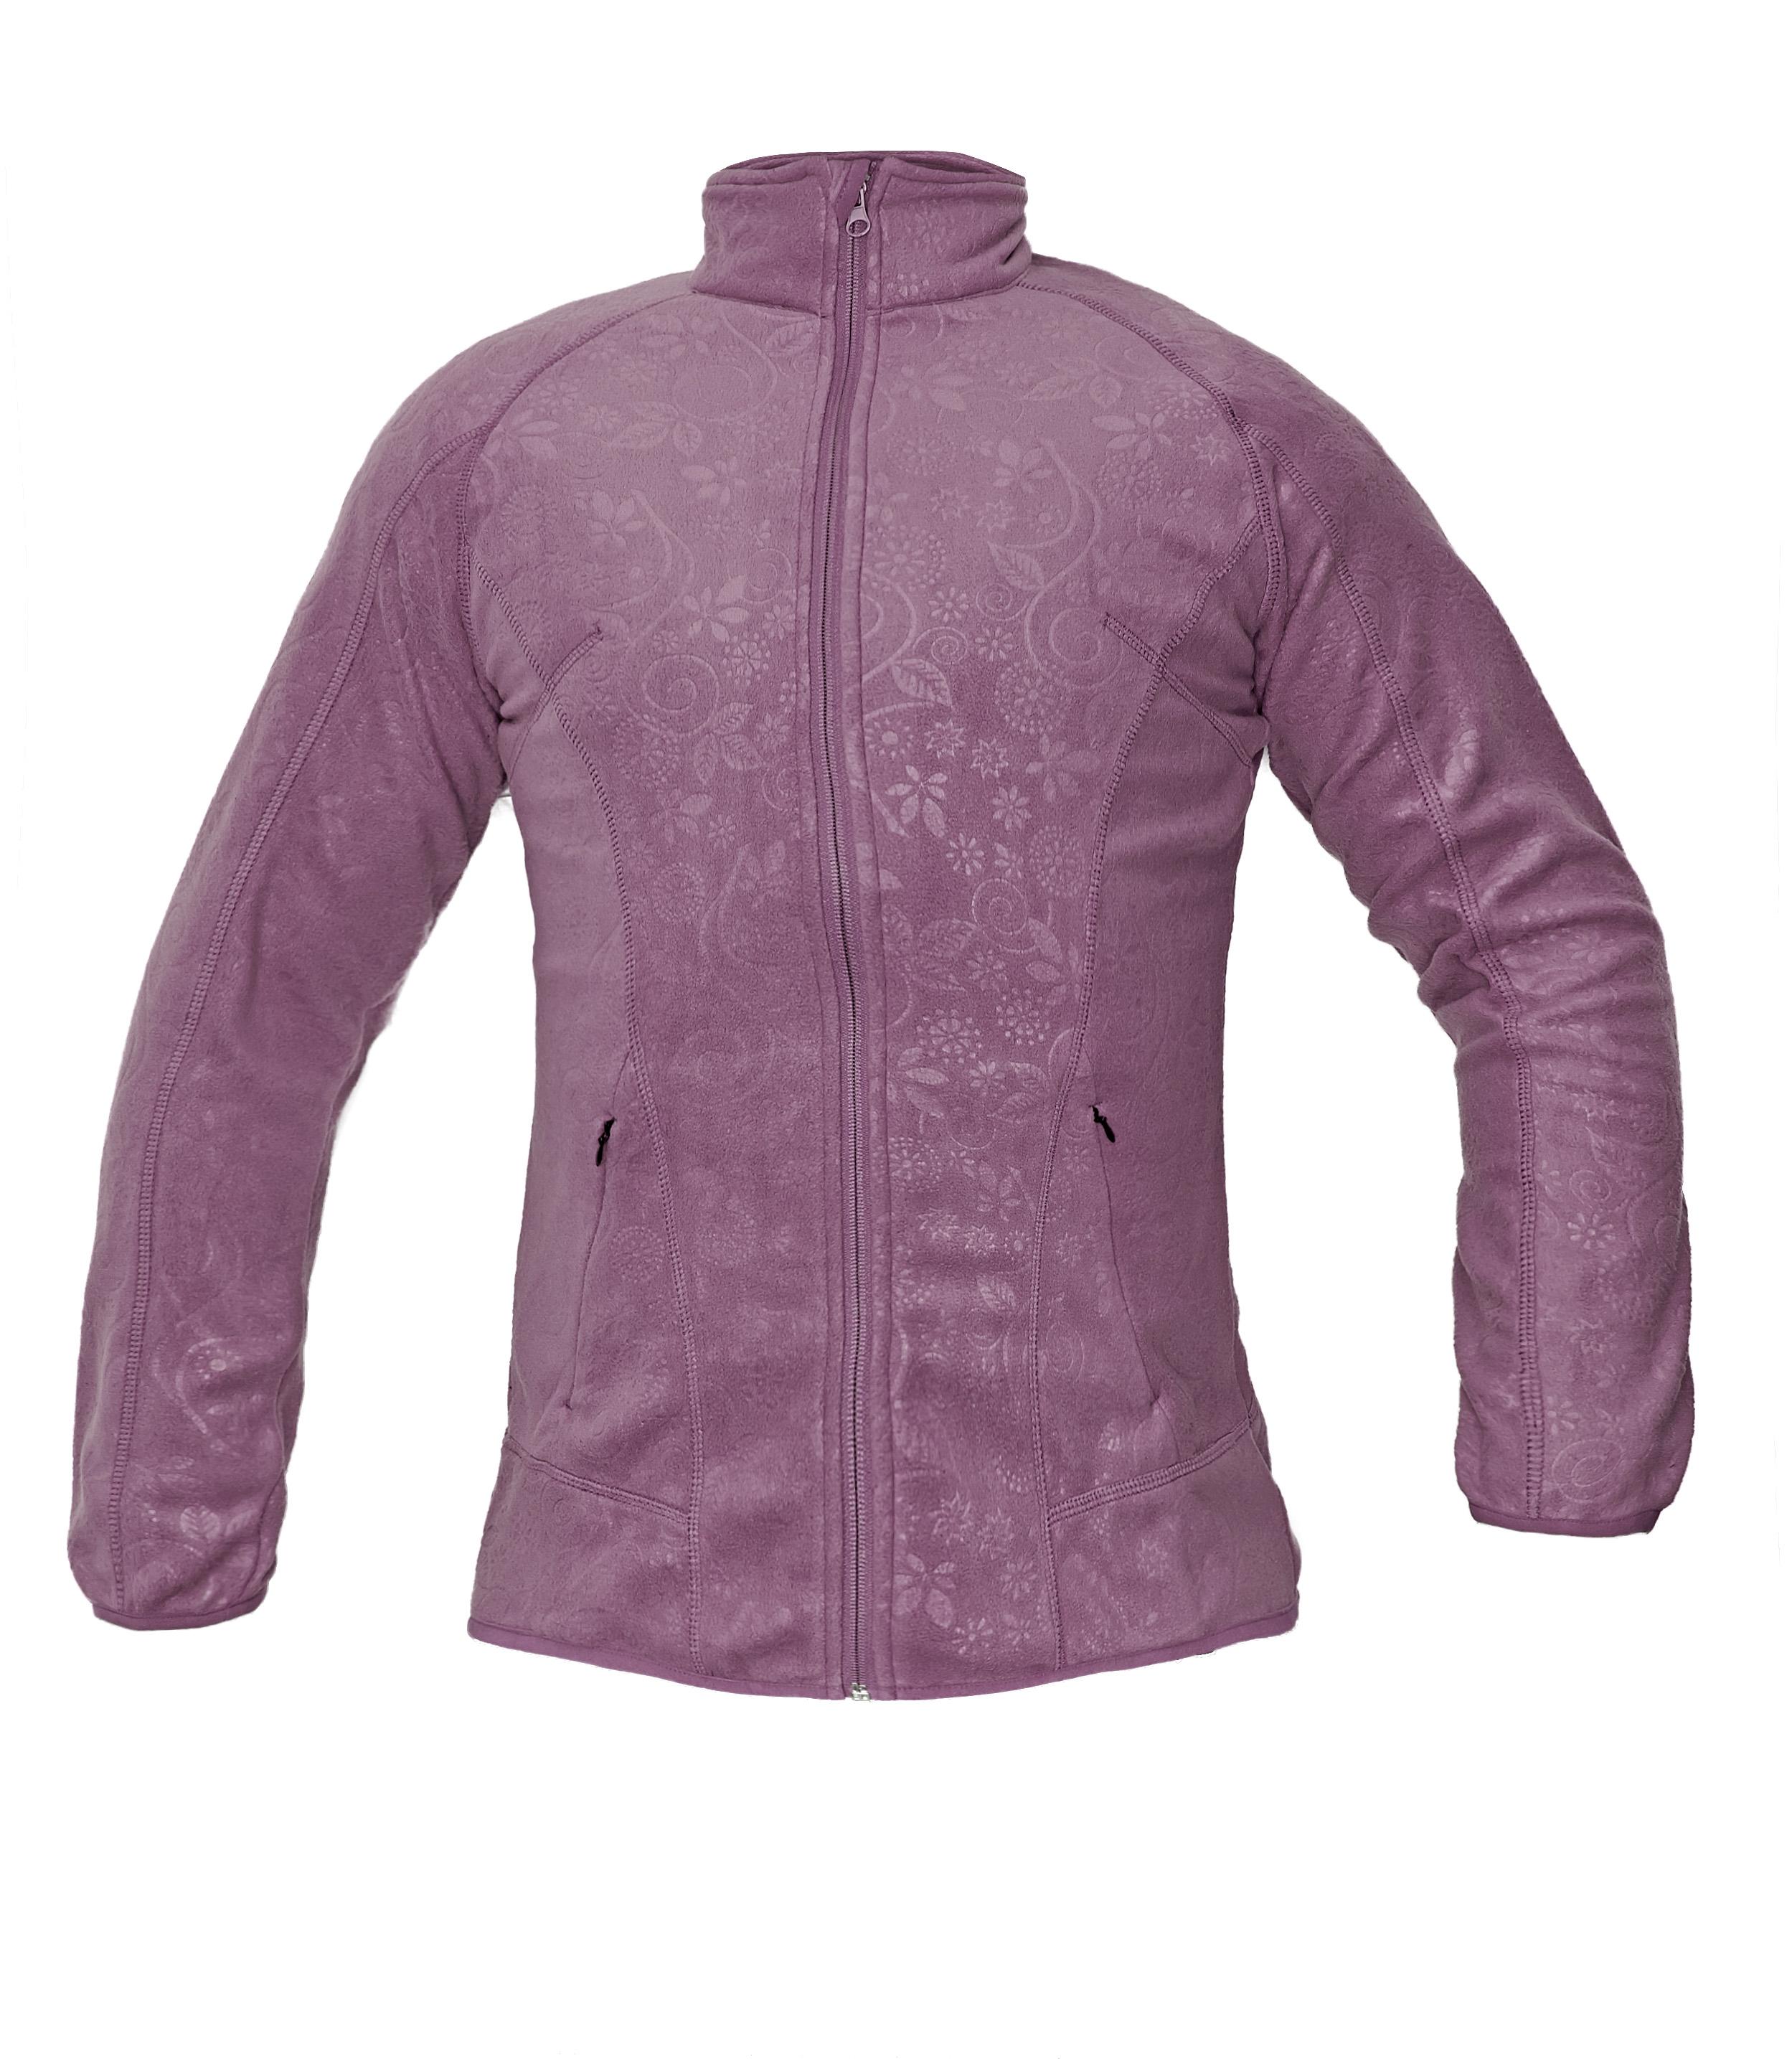 YOWIE fleece mikina růžová 03010323 57  S